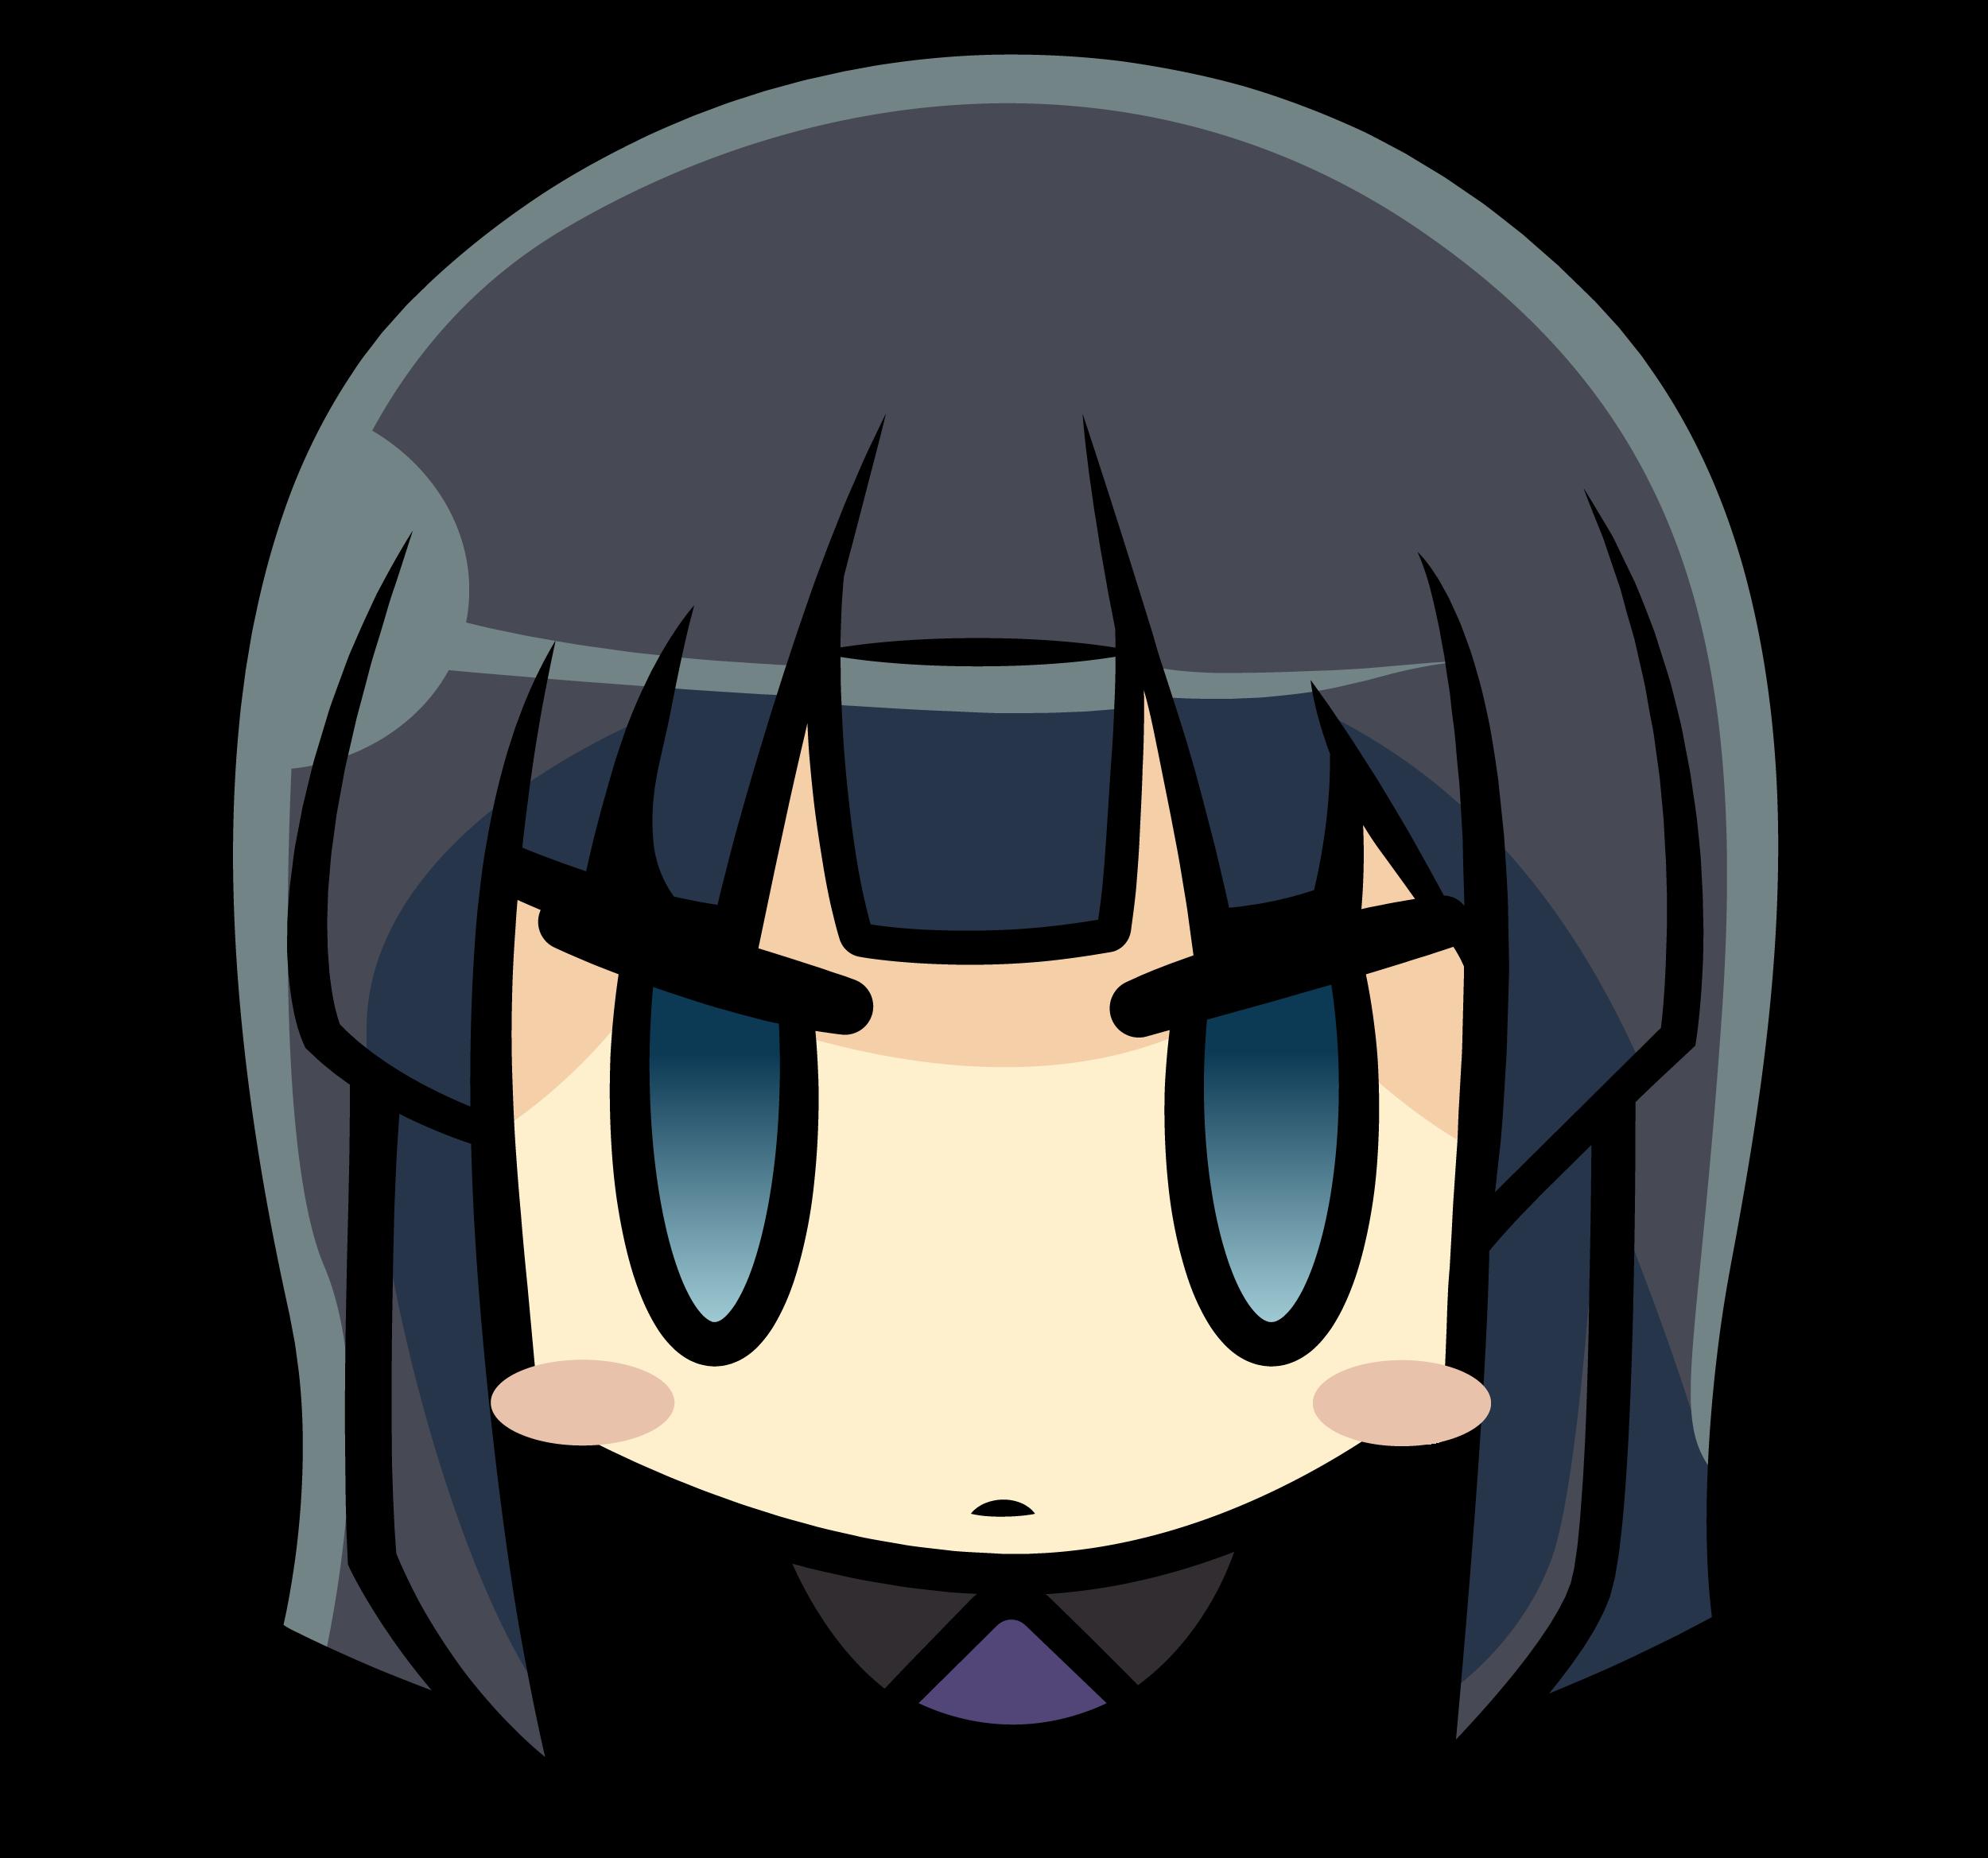 ChibiIkaruga